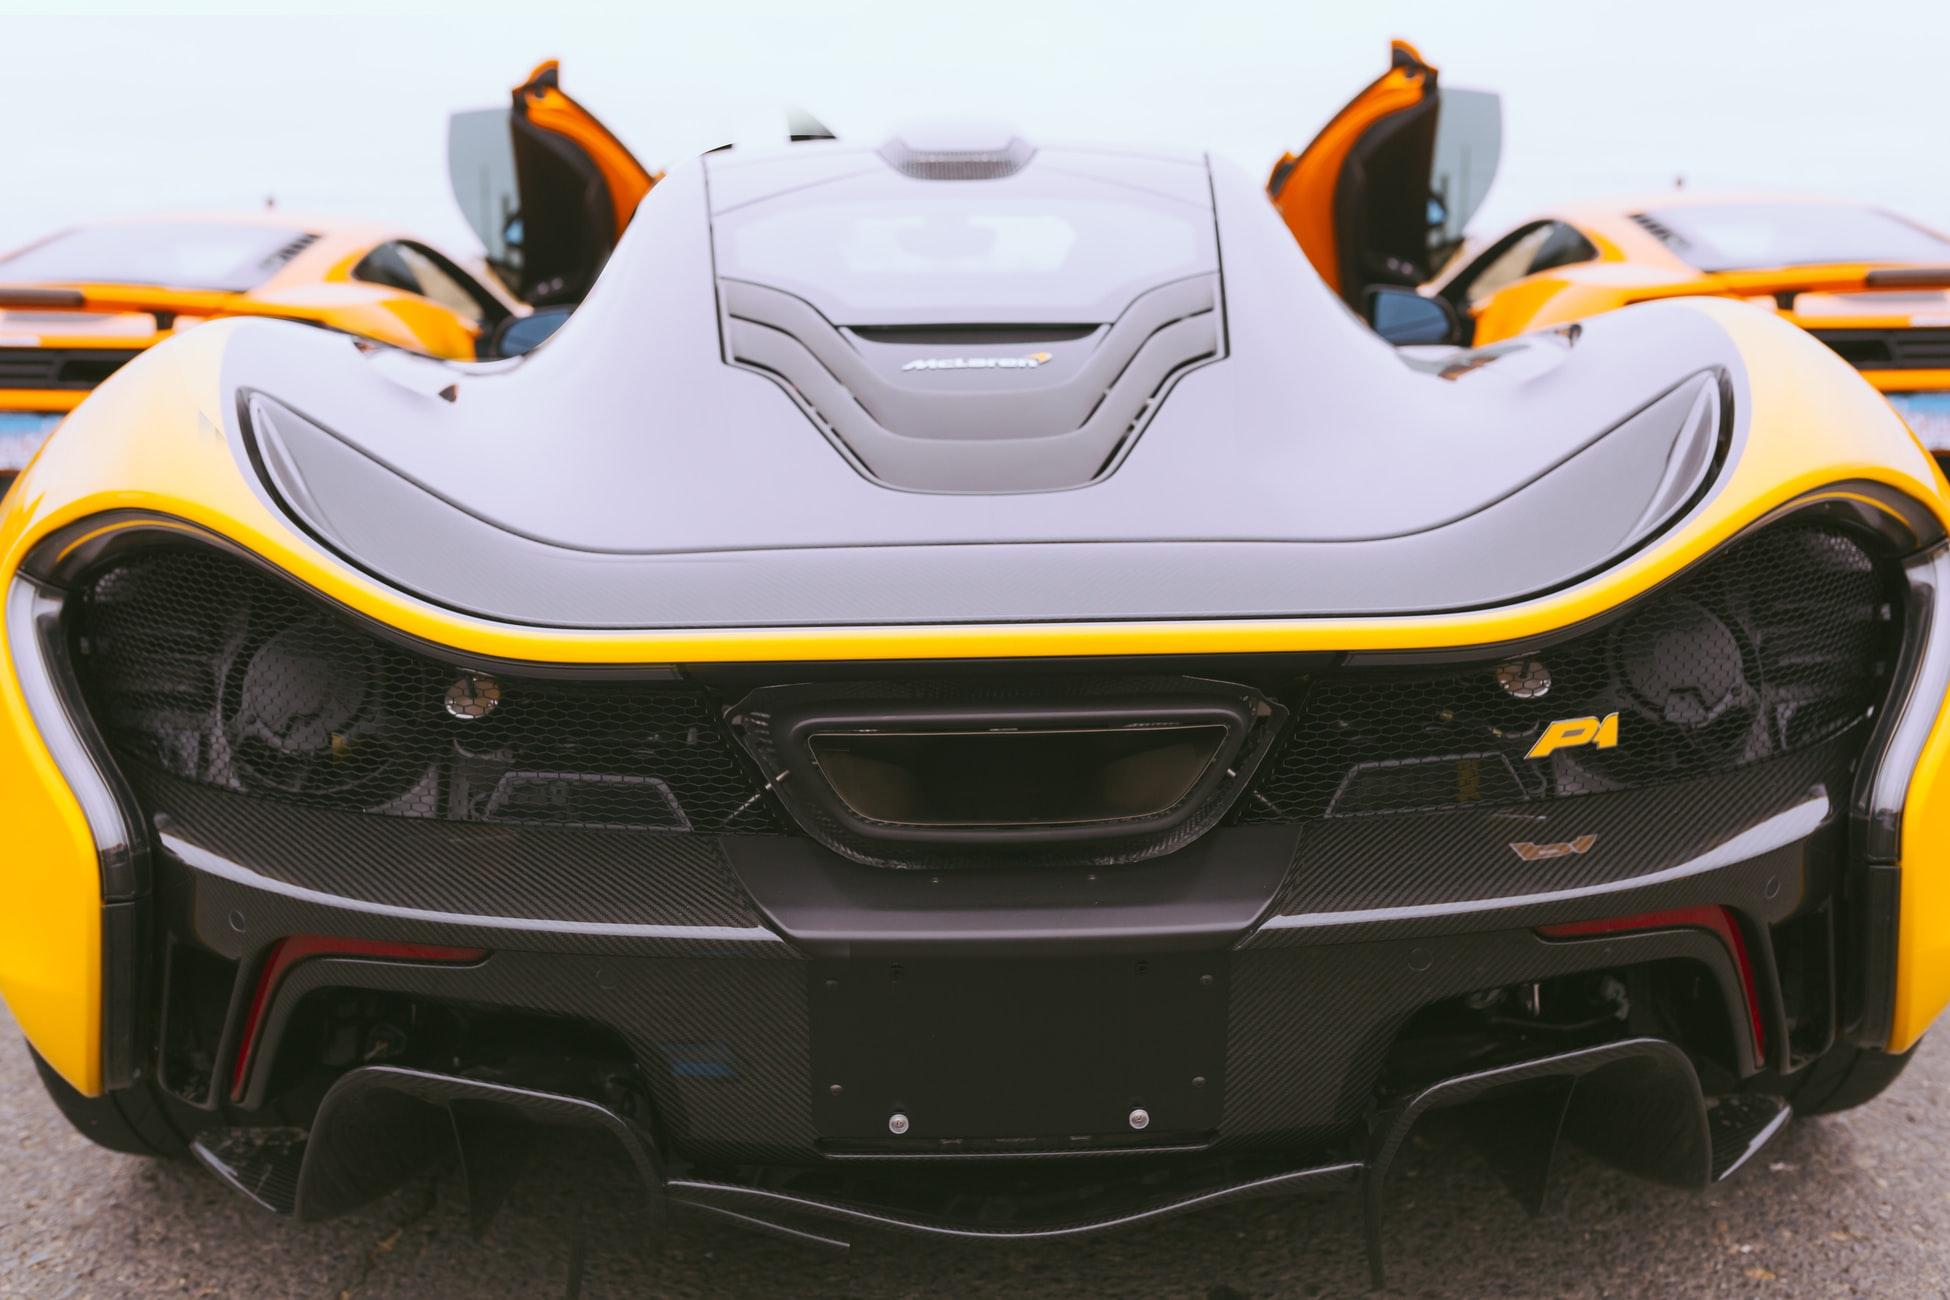 McLaren P1, Automative Engineering, Acres Engineering, UK, Global Engineering Manufacturing